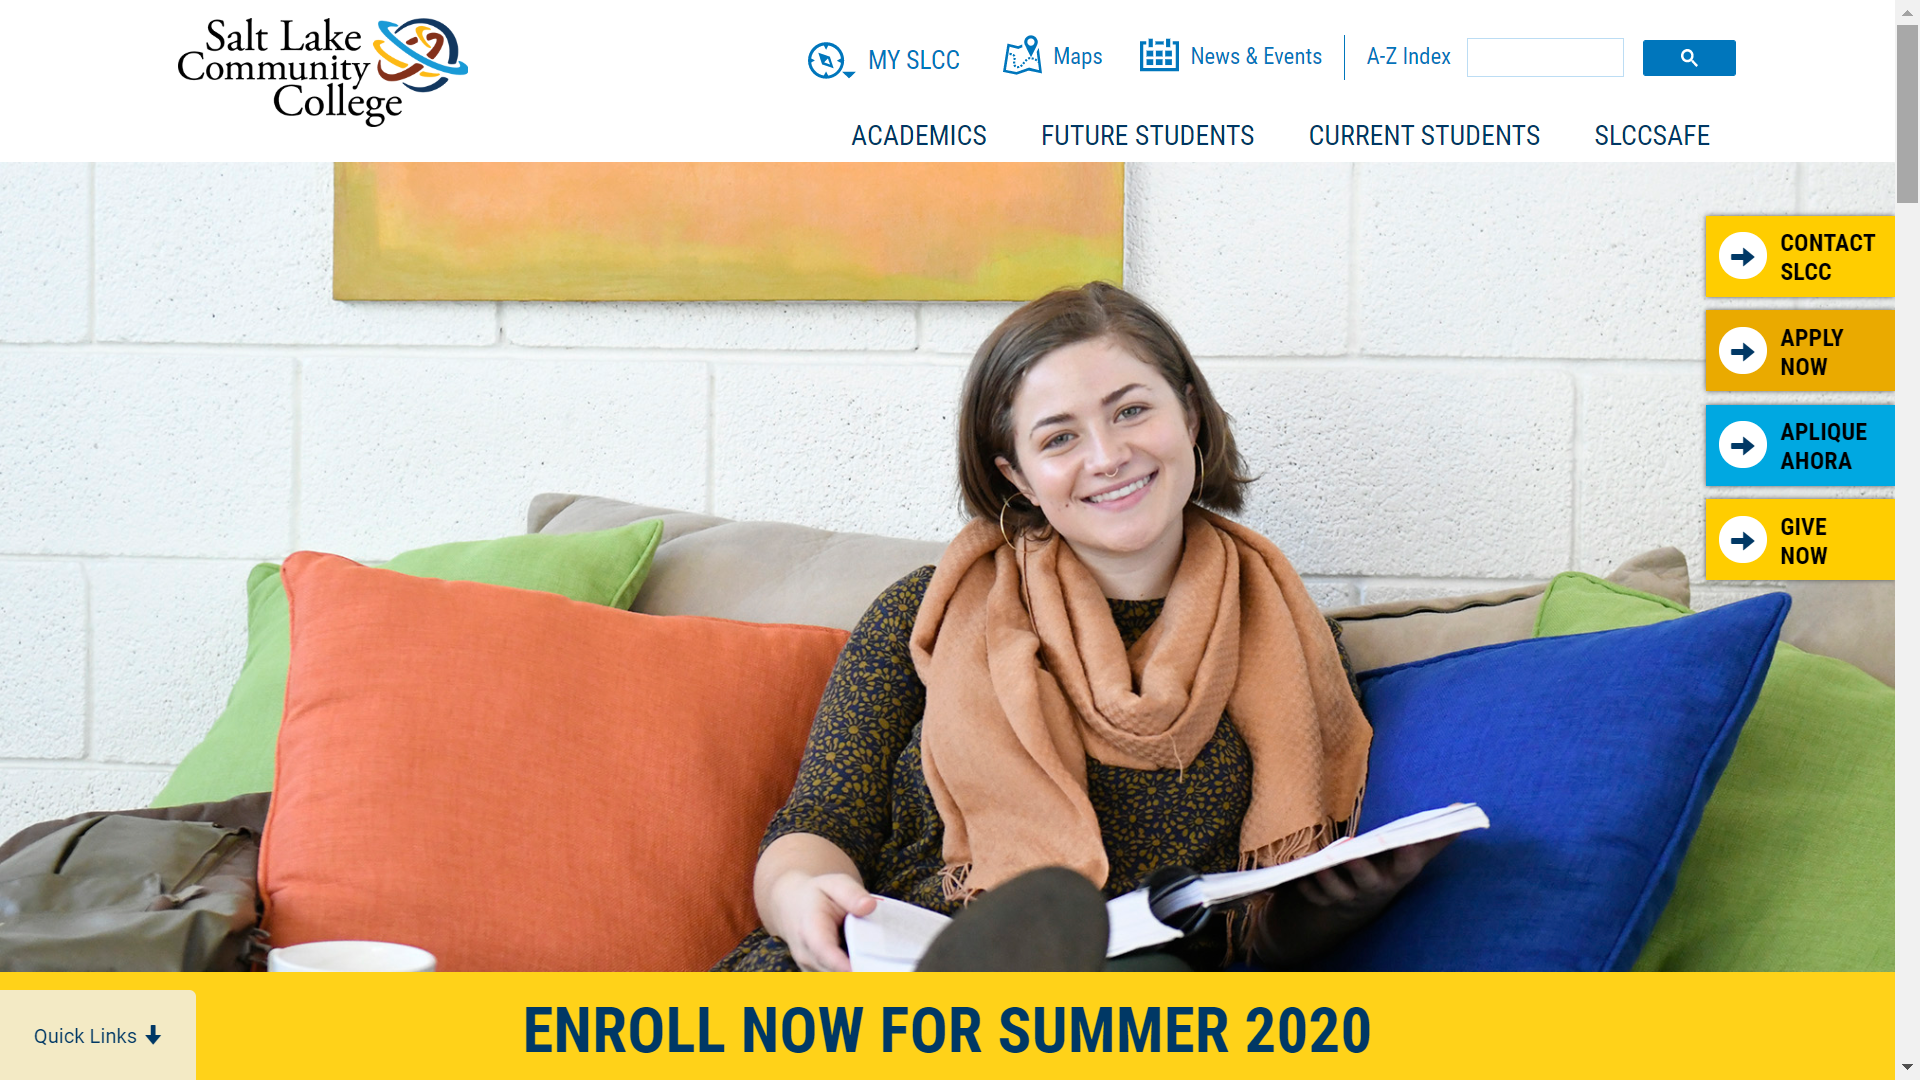 screenshot of the SLCC homepage